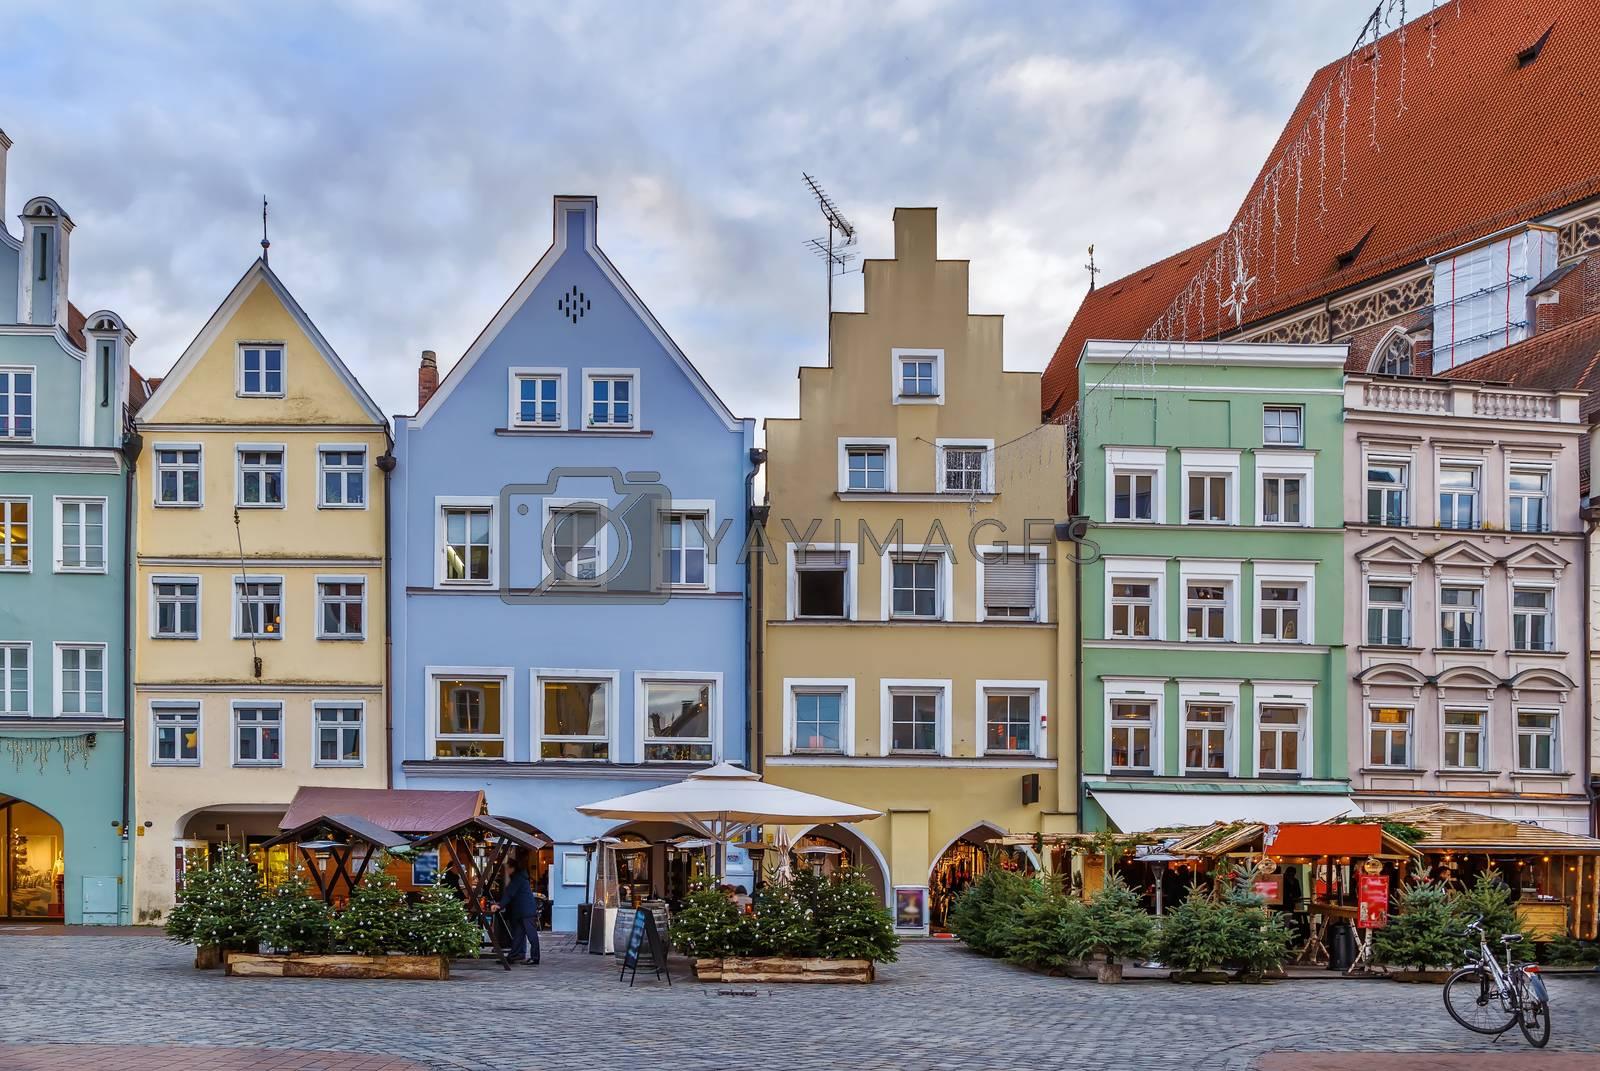 Historical houses on Altstadt street in Landshut, Germany